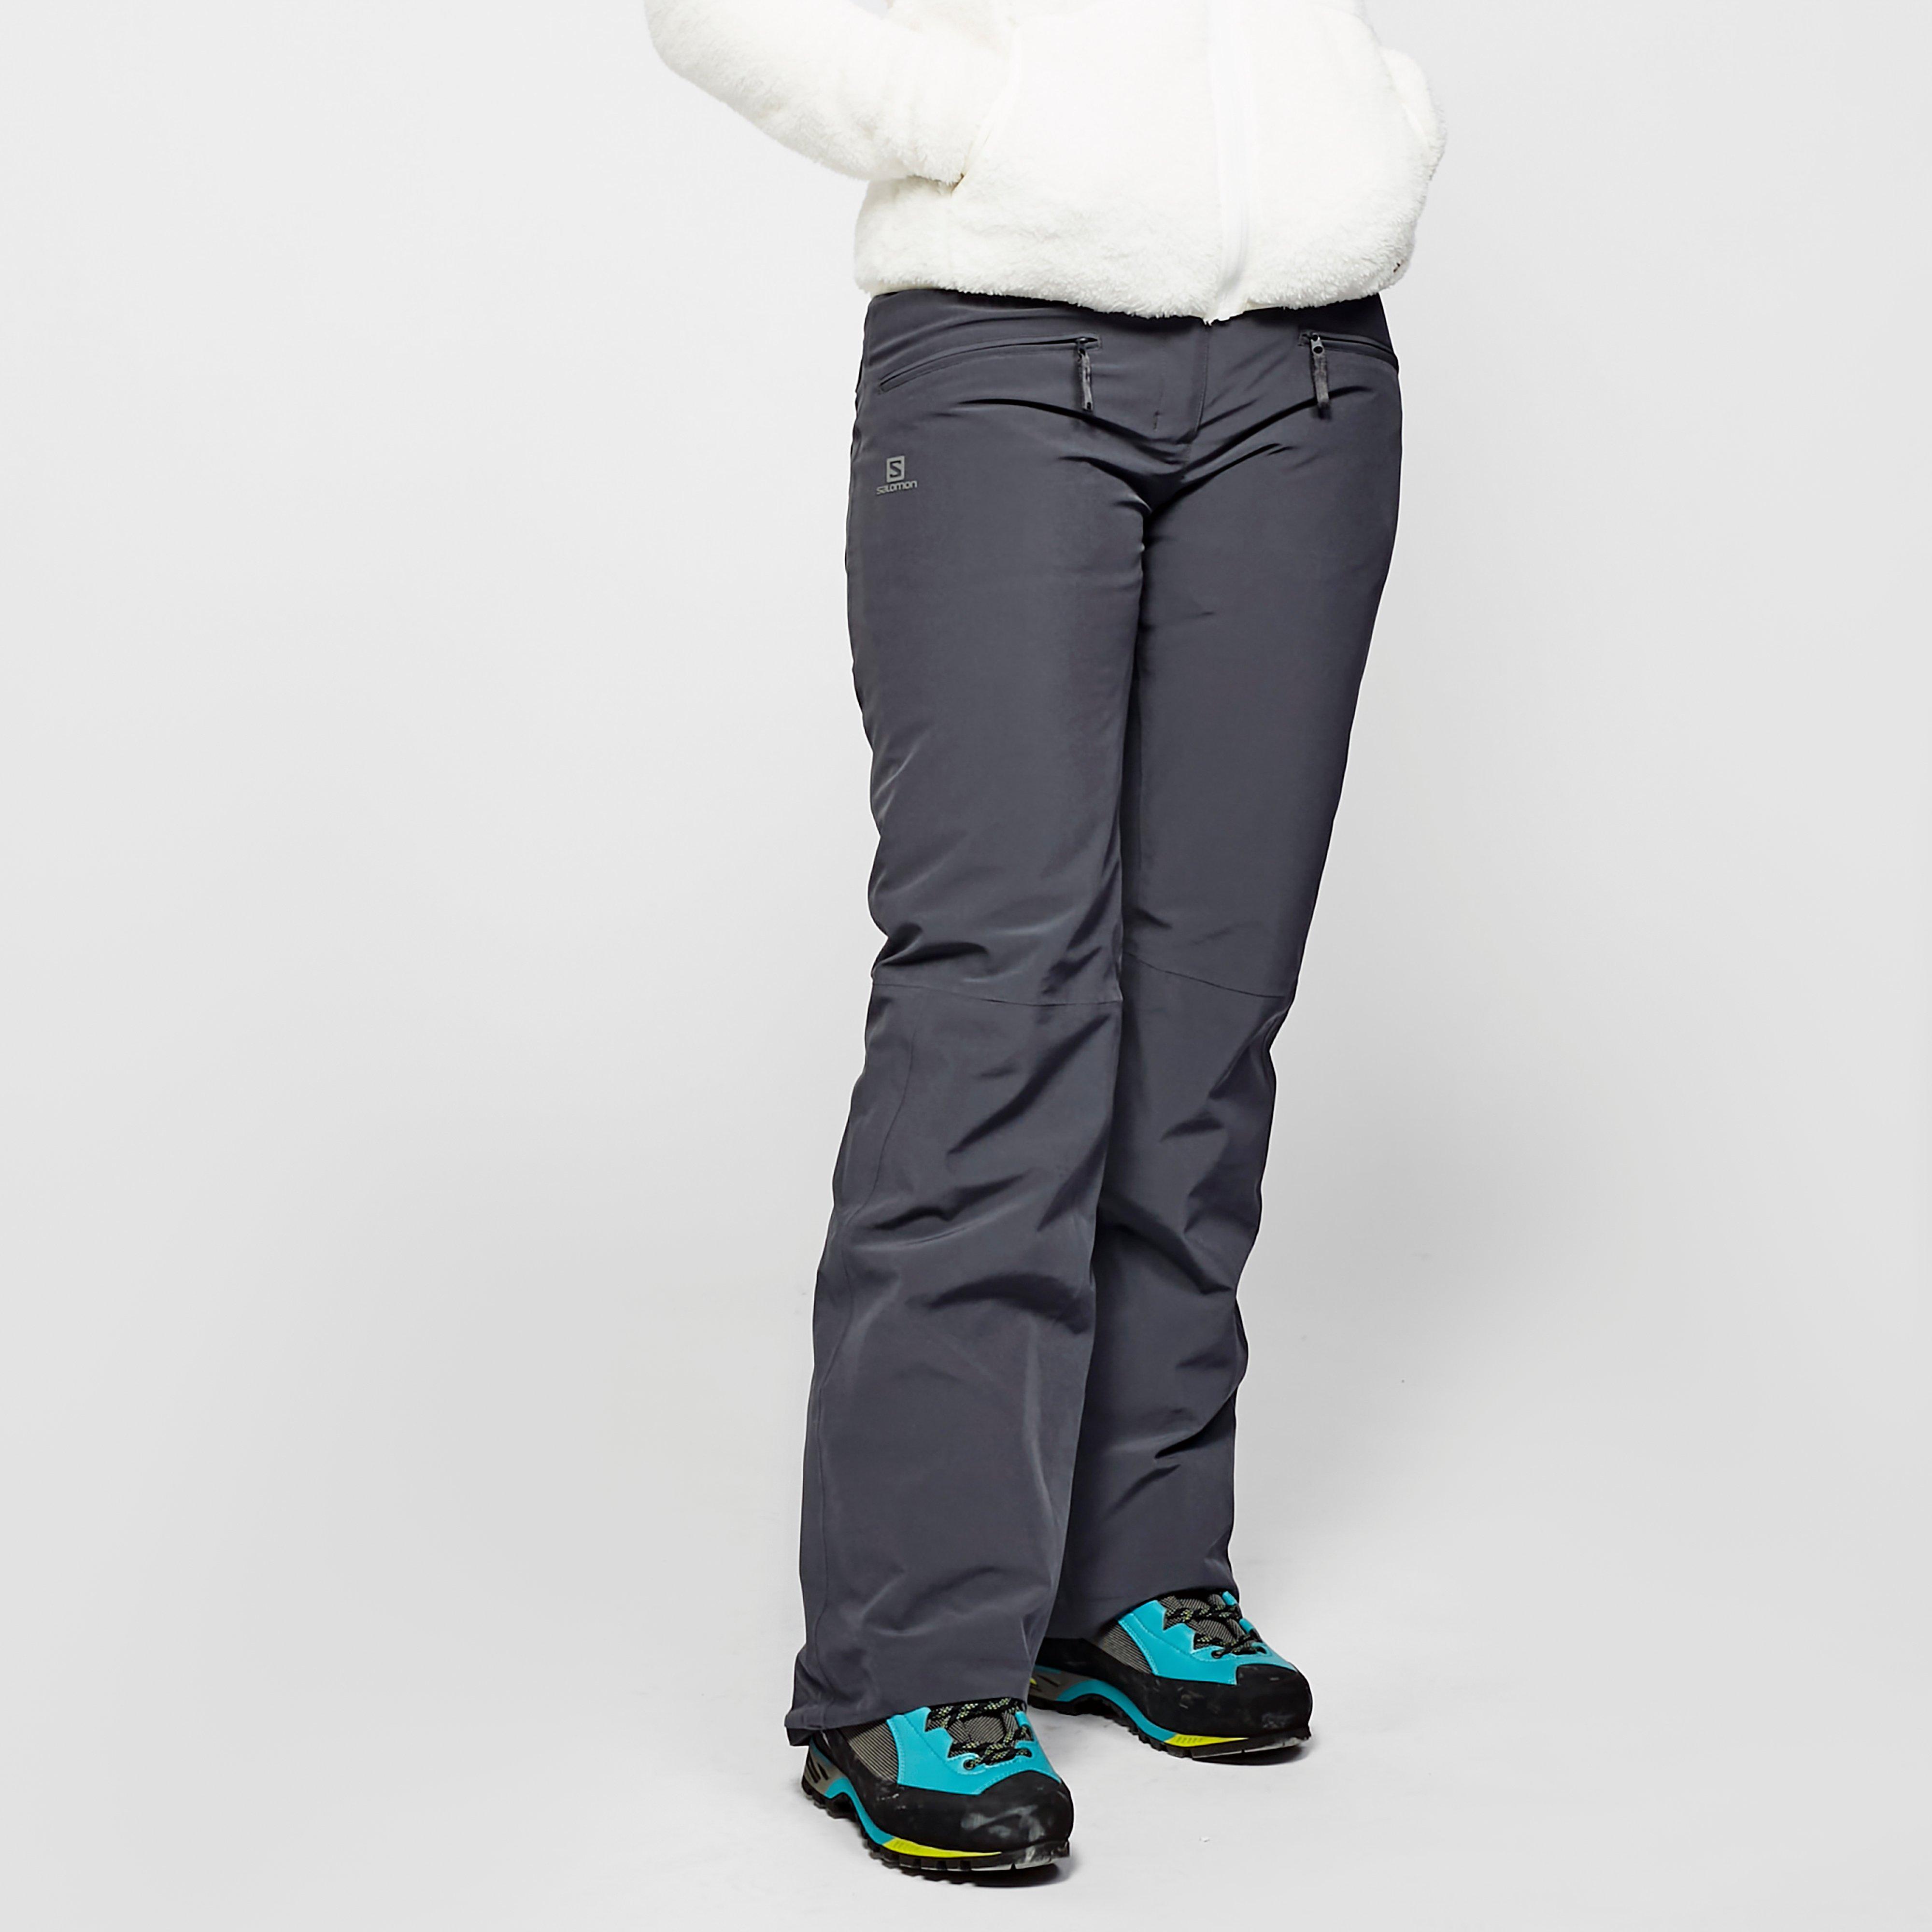 Salomon Women's Edge Ski Pants - Grey, Grey